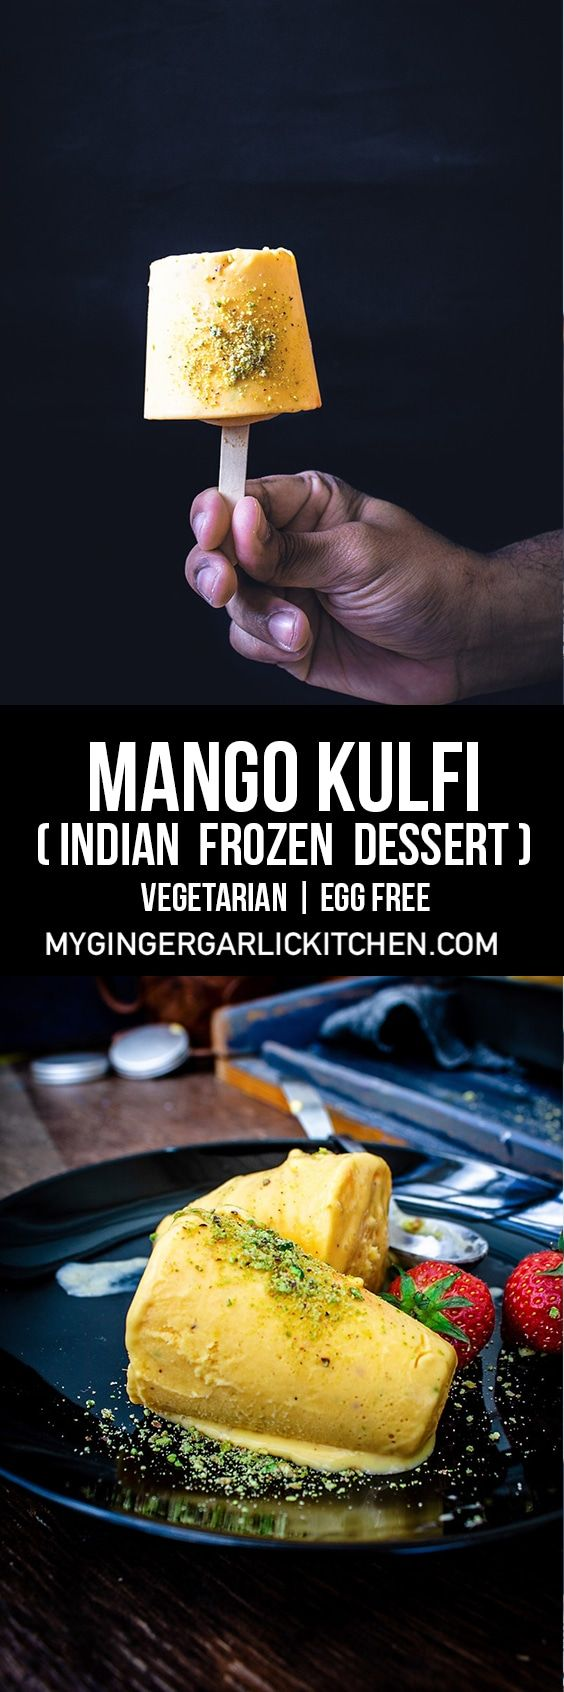 Mango kulfi recipe easy no cook mango kulfi recipe with milkmaid